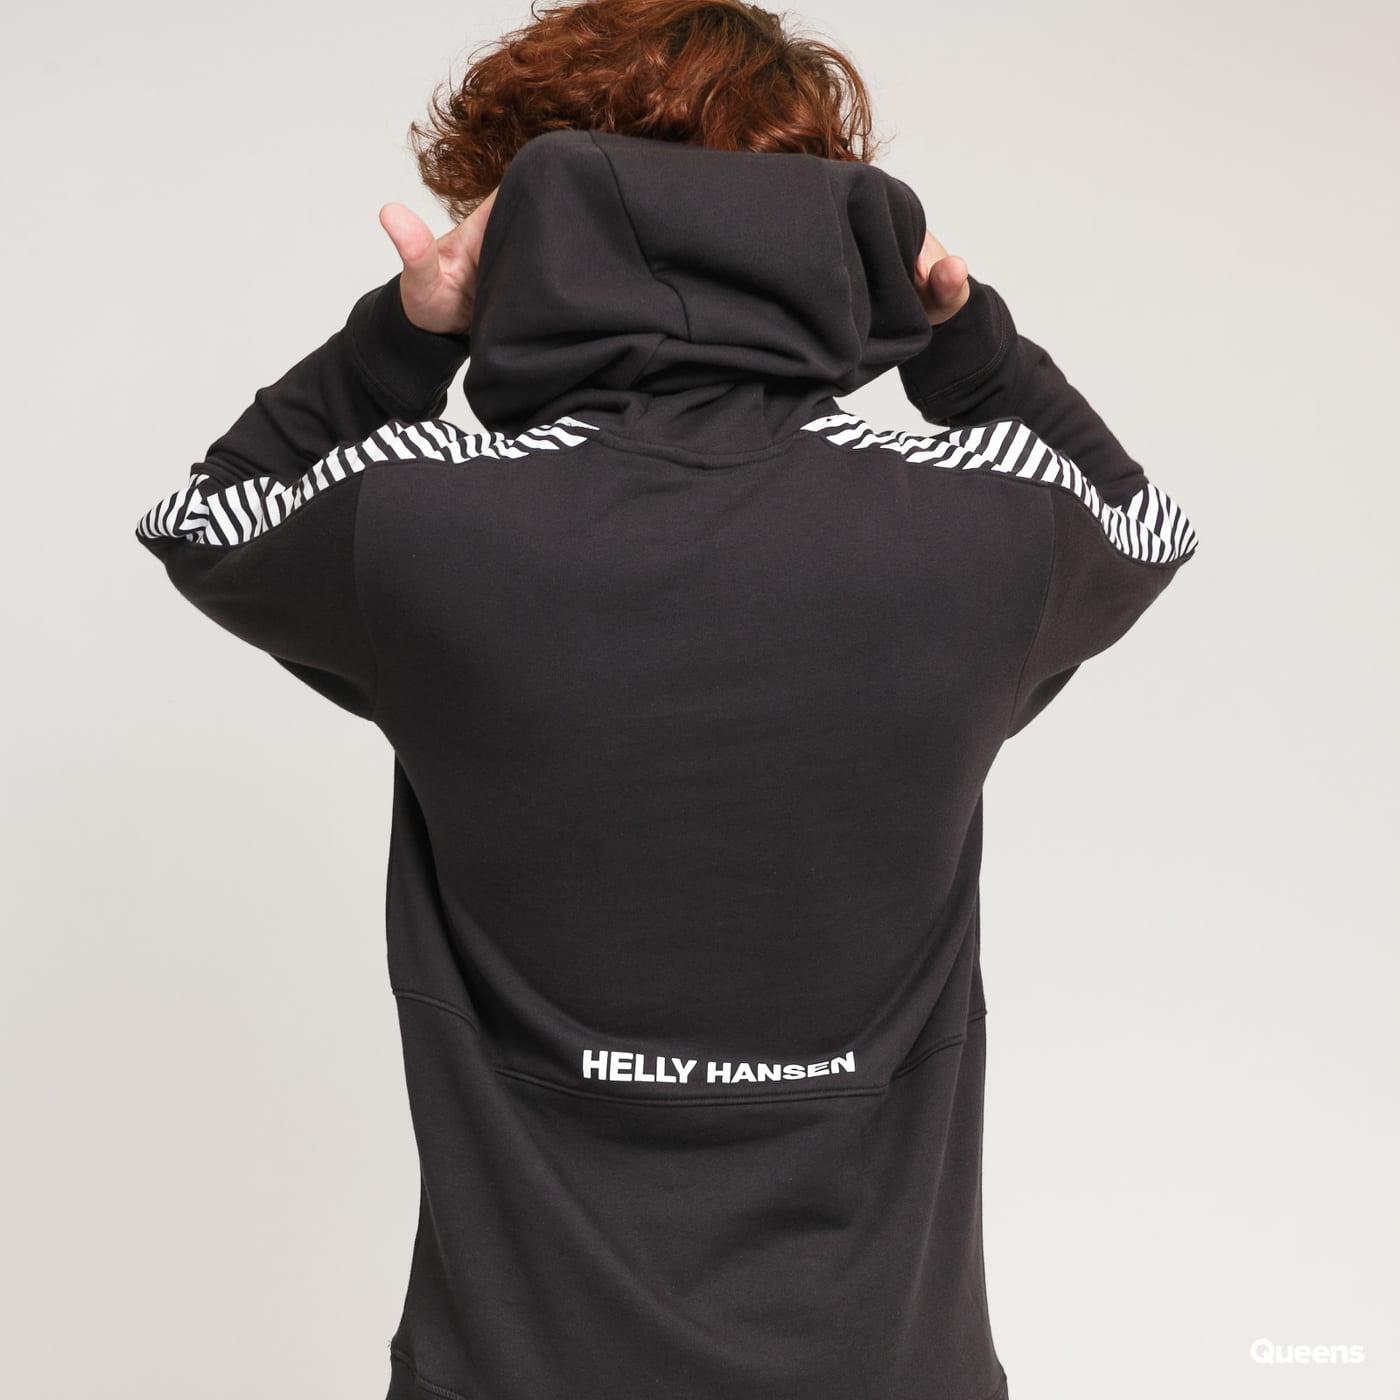 Helly Hansen Active Hoodie tmavě šedá